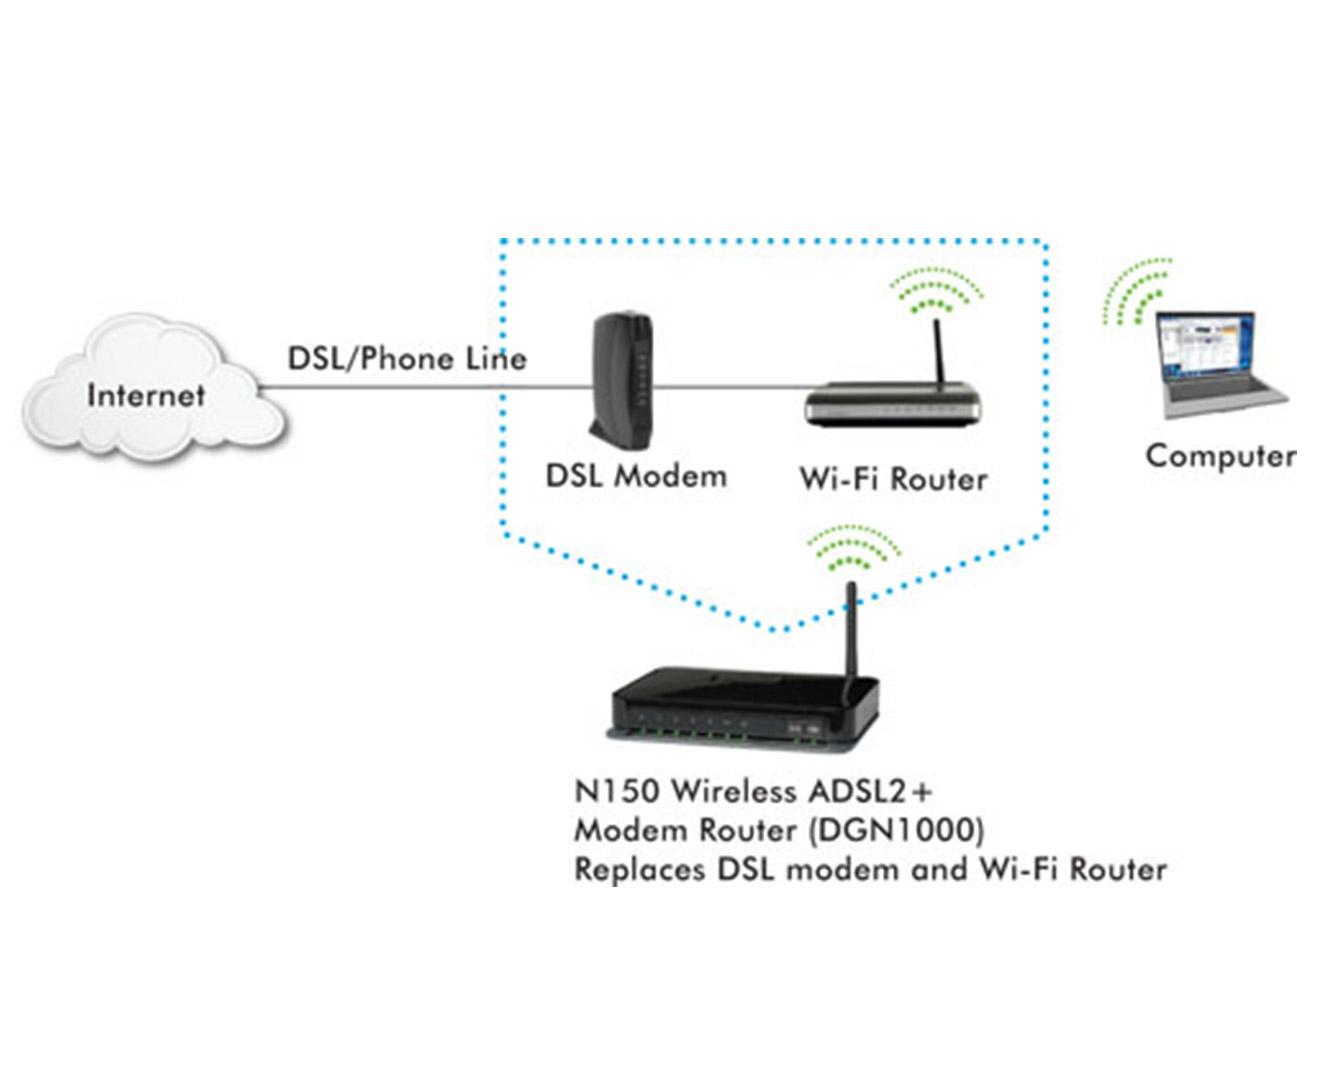 Netgear Dgn1000 Wireless Modem Router Black Diagram